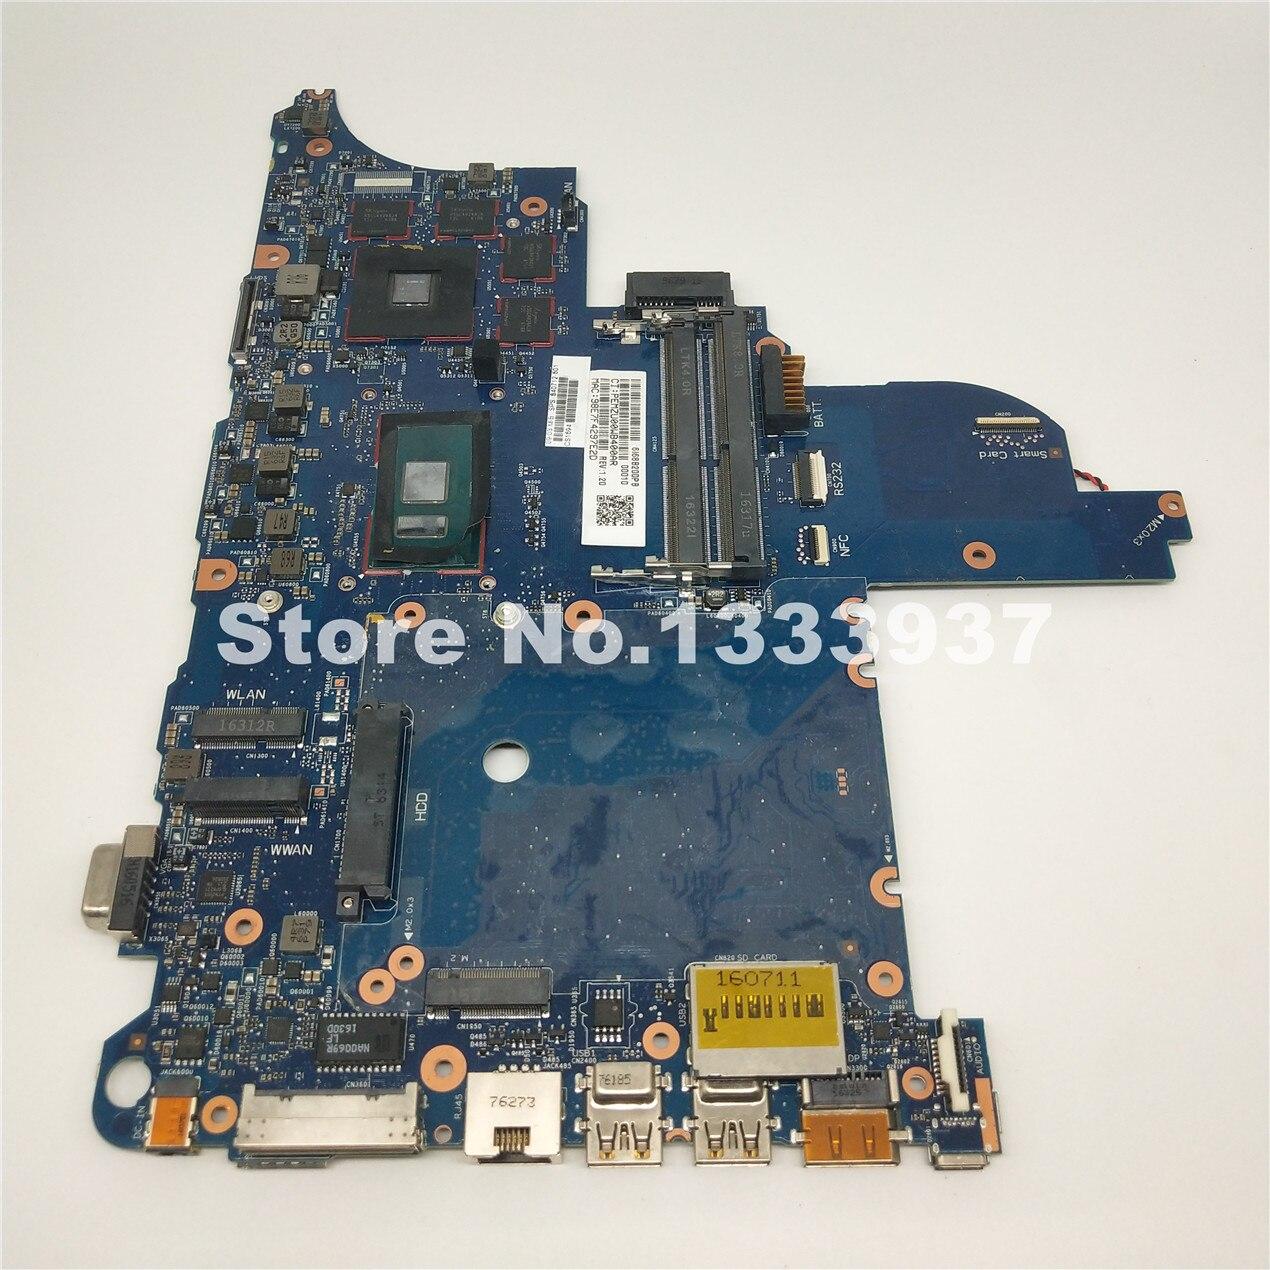 Mainboard 840712-601 840712-501 840712-001 Para HP ProBook 640 G2 650 G2 640-G2 650-G2 Laptop motherboard I5-6300U SR2F0